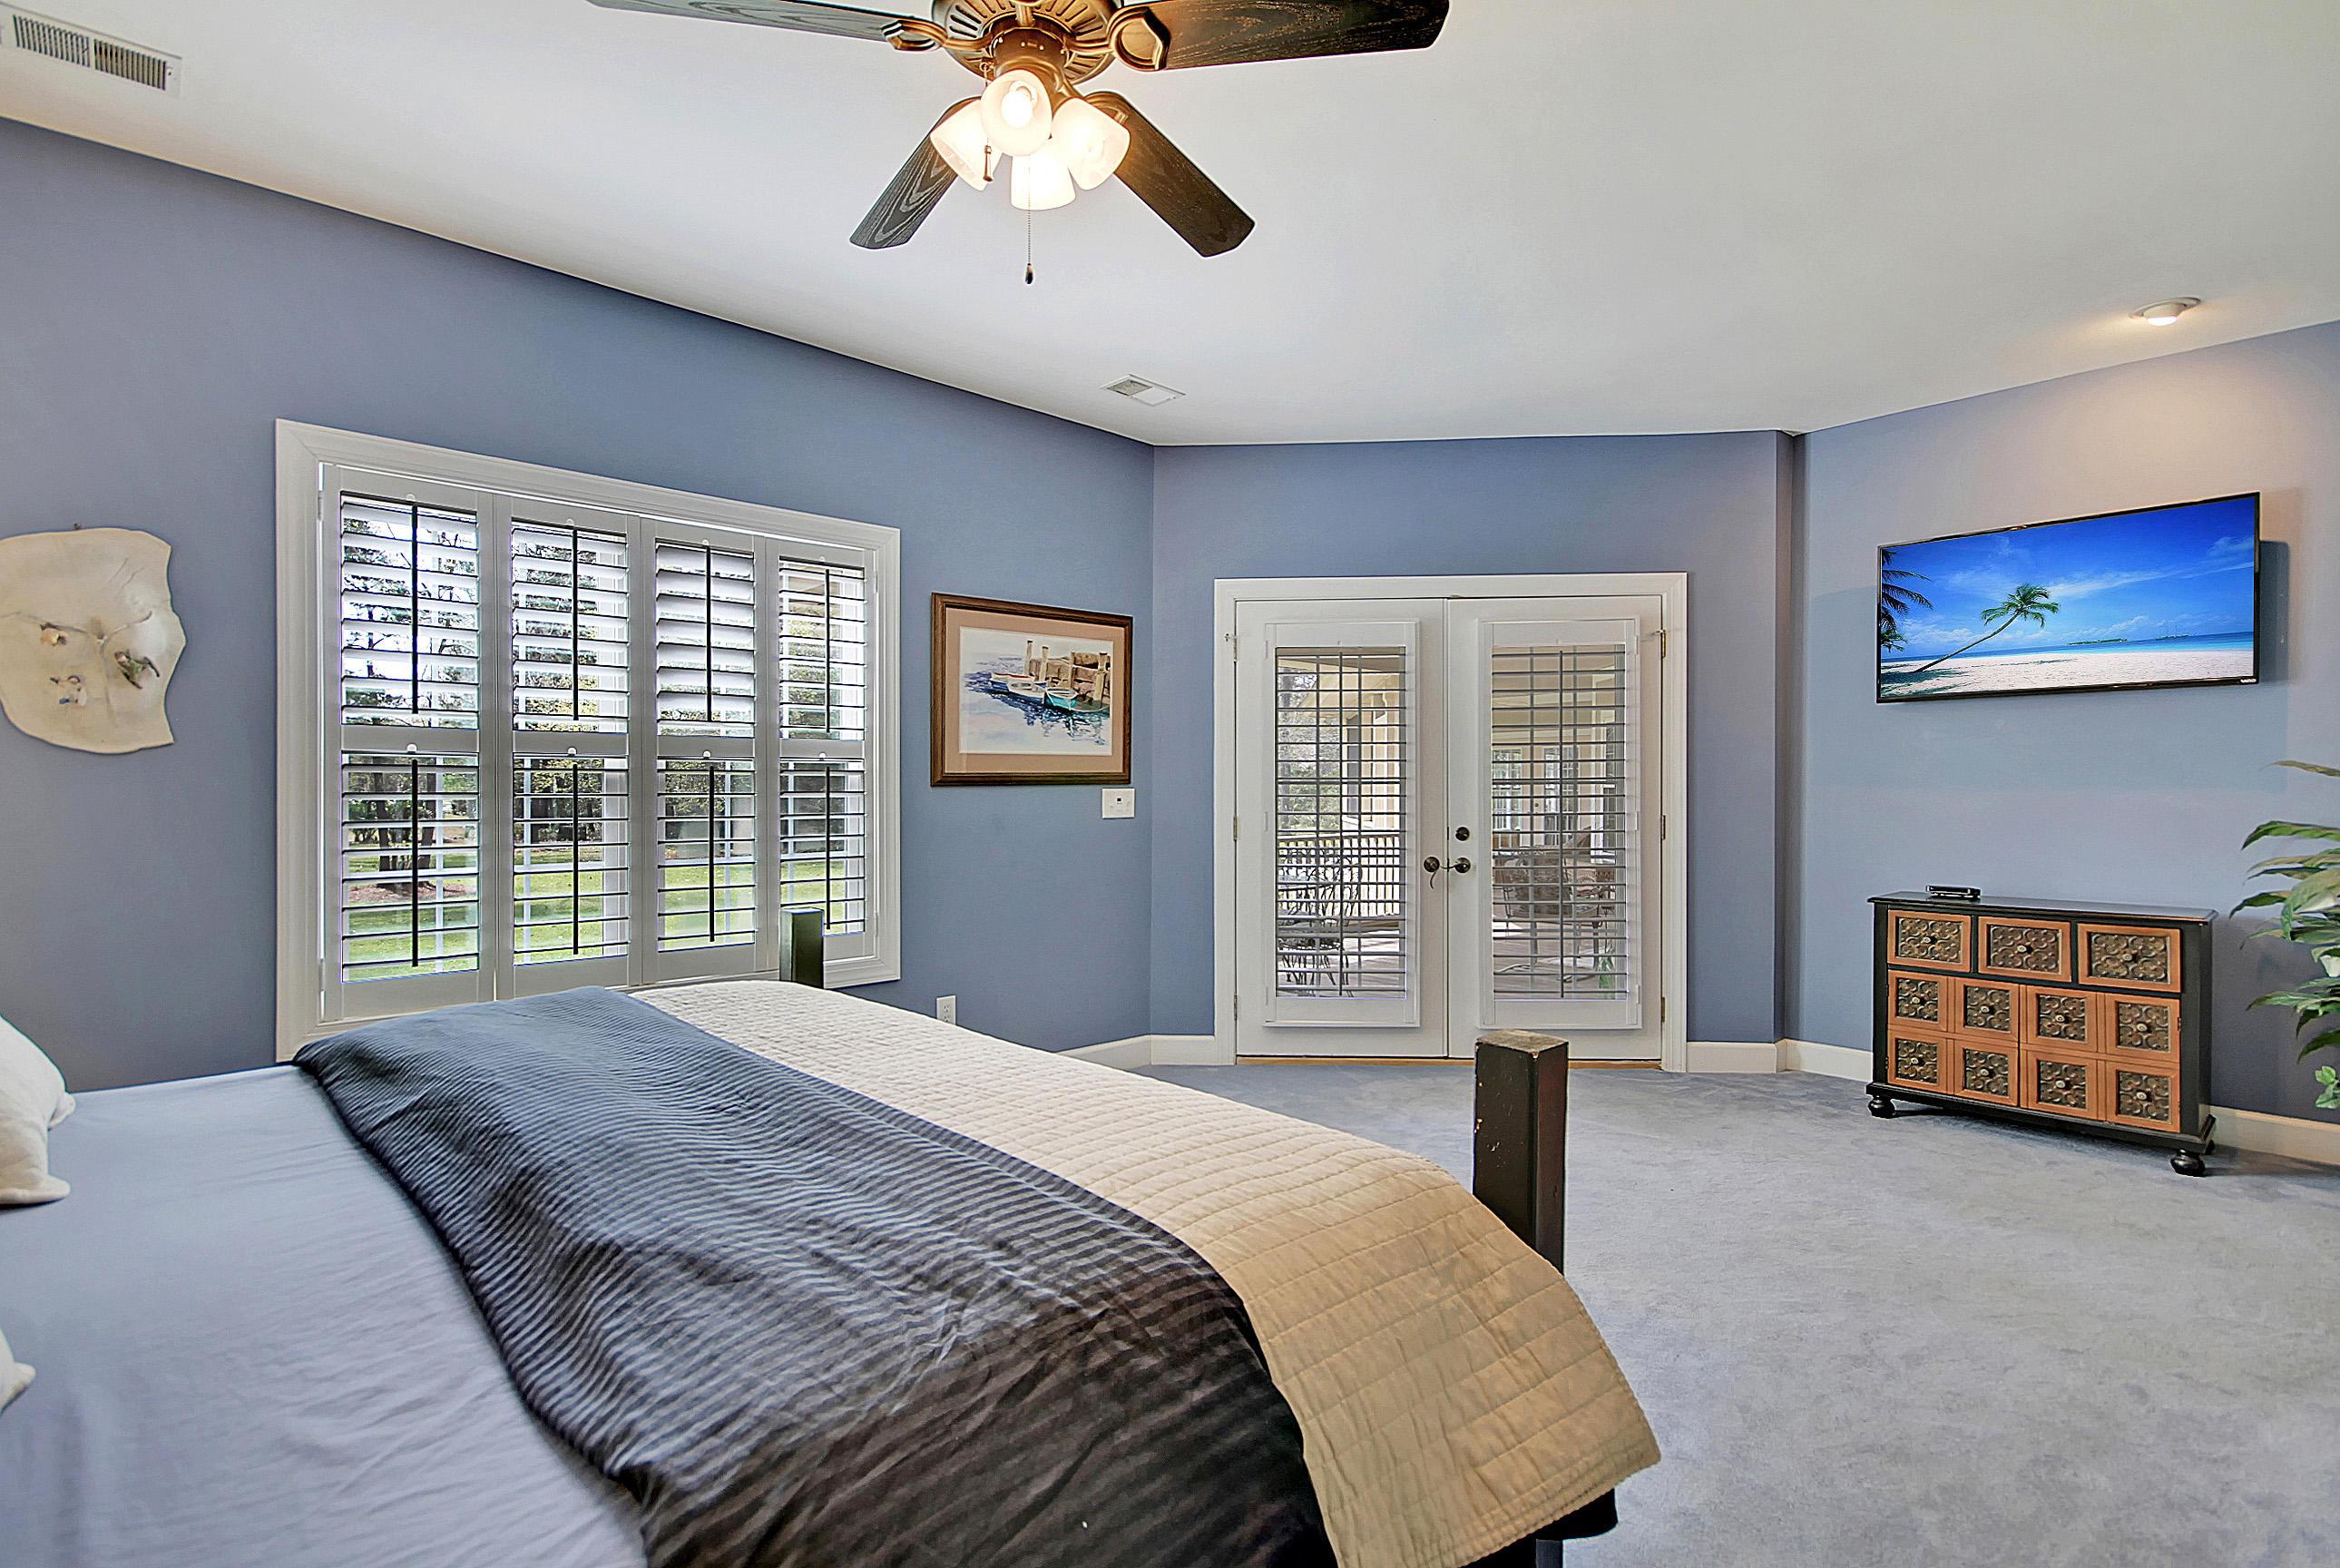 Dunes West Homes For Sale - 4002 Colonel Vanderhorst, Mount Pleasant, SC - 37